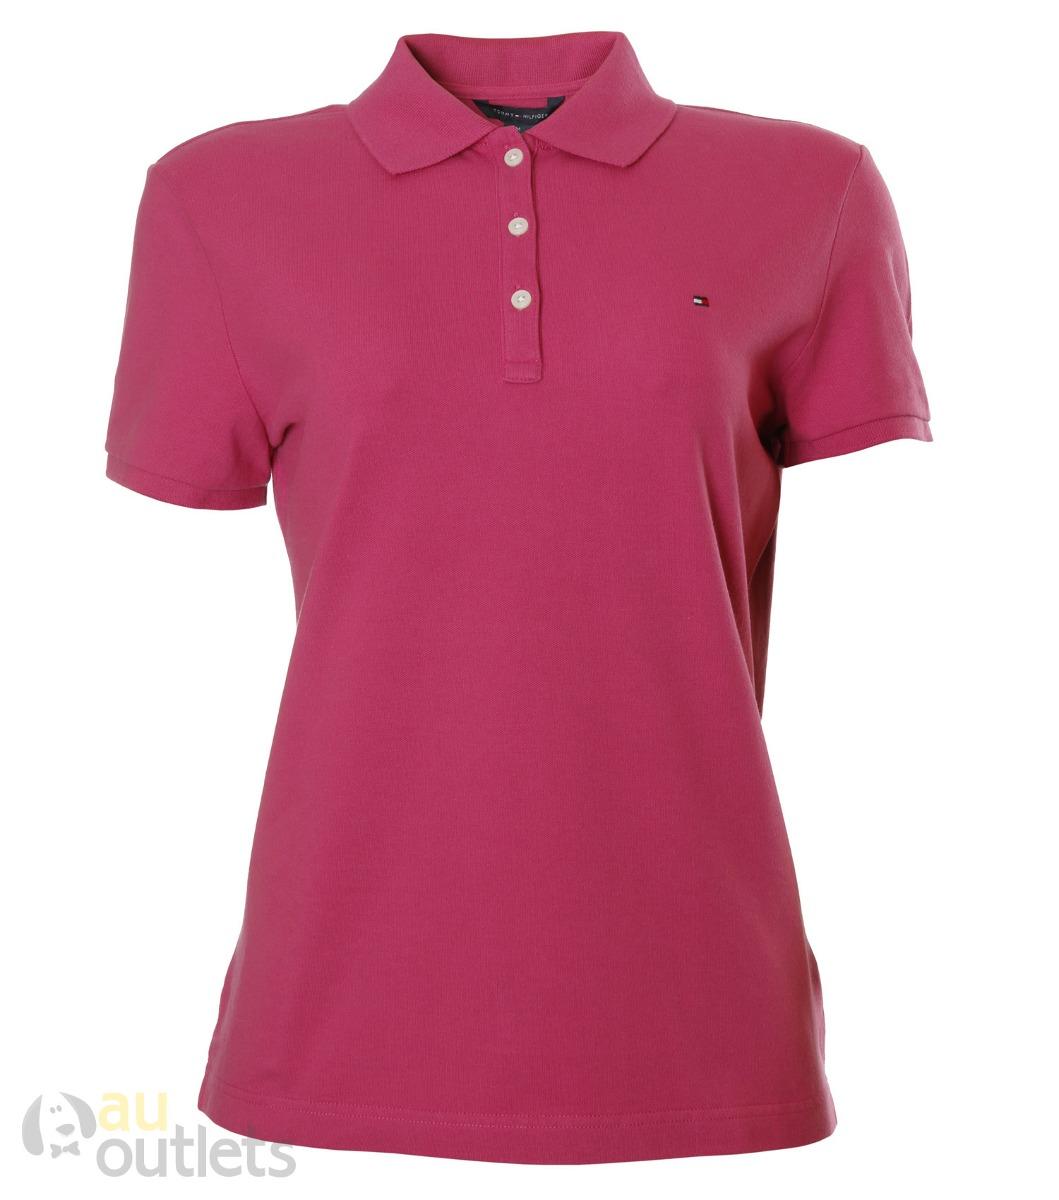 camisa polo feminina tommy hilfiger santina. Carregando zoom. 3fa4e633a73bc